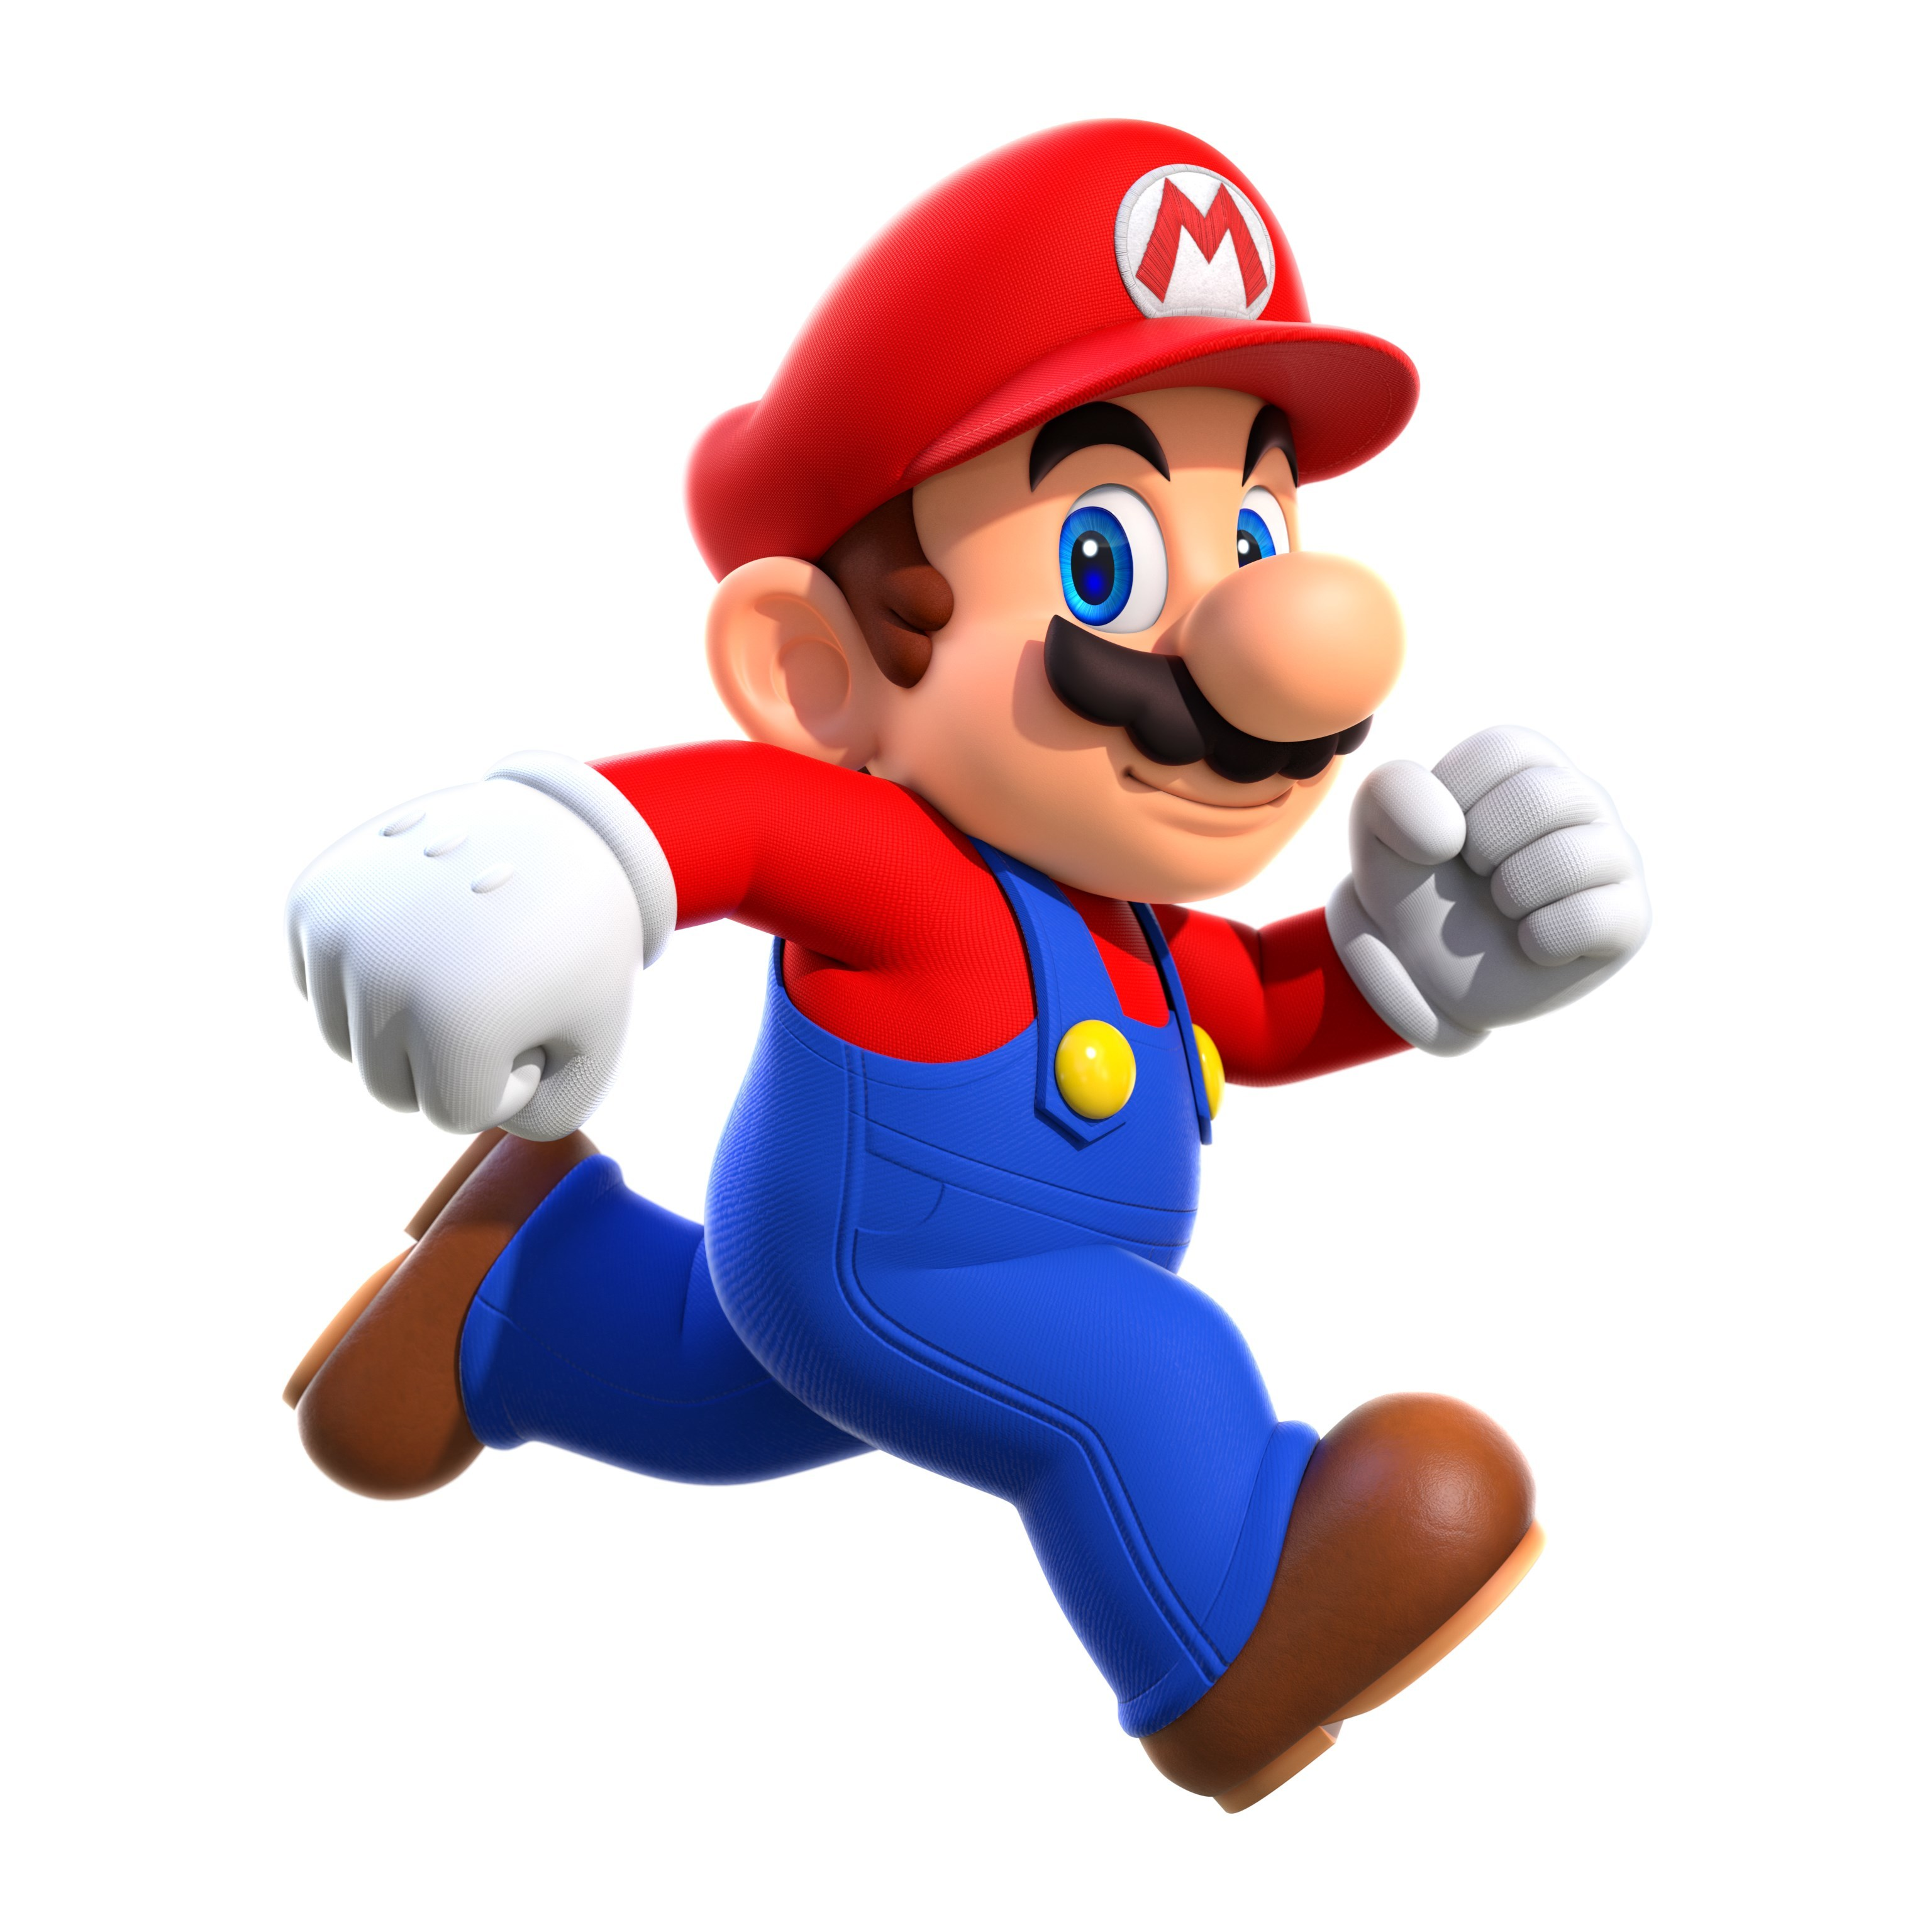 Mario Kart 64 Coming To Wii U Tomorrow